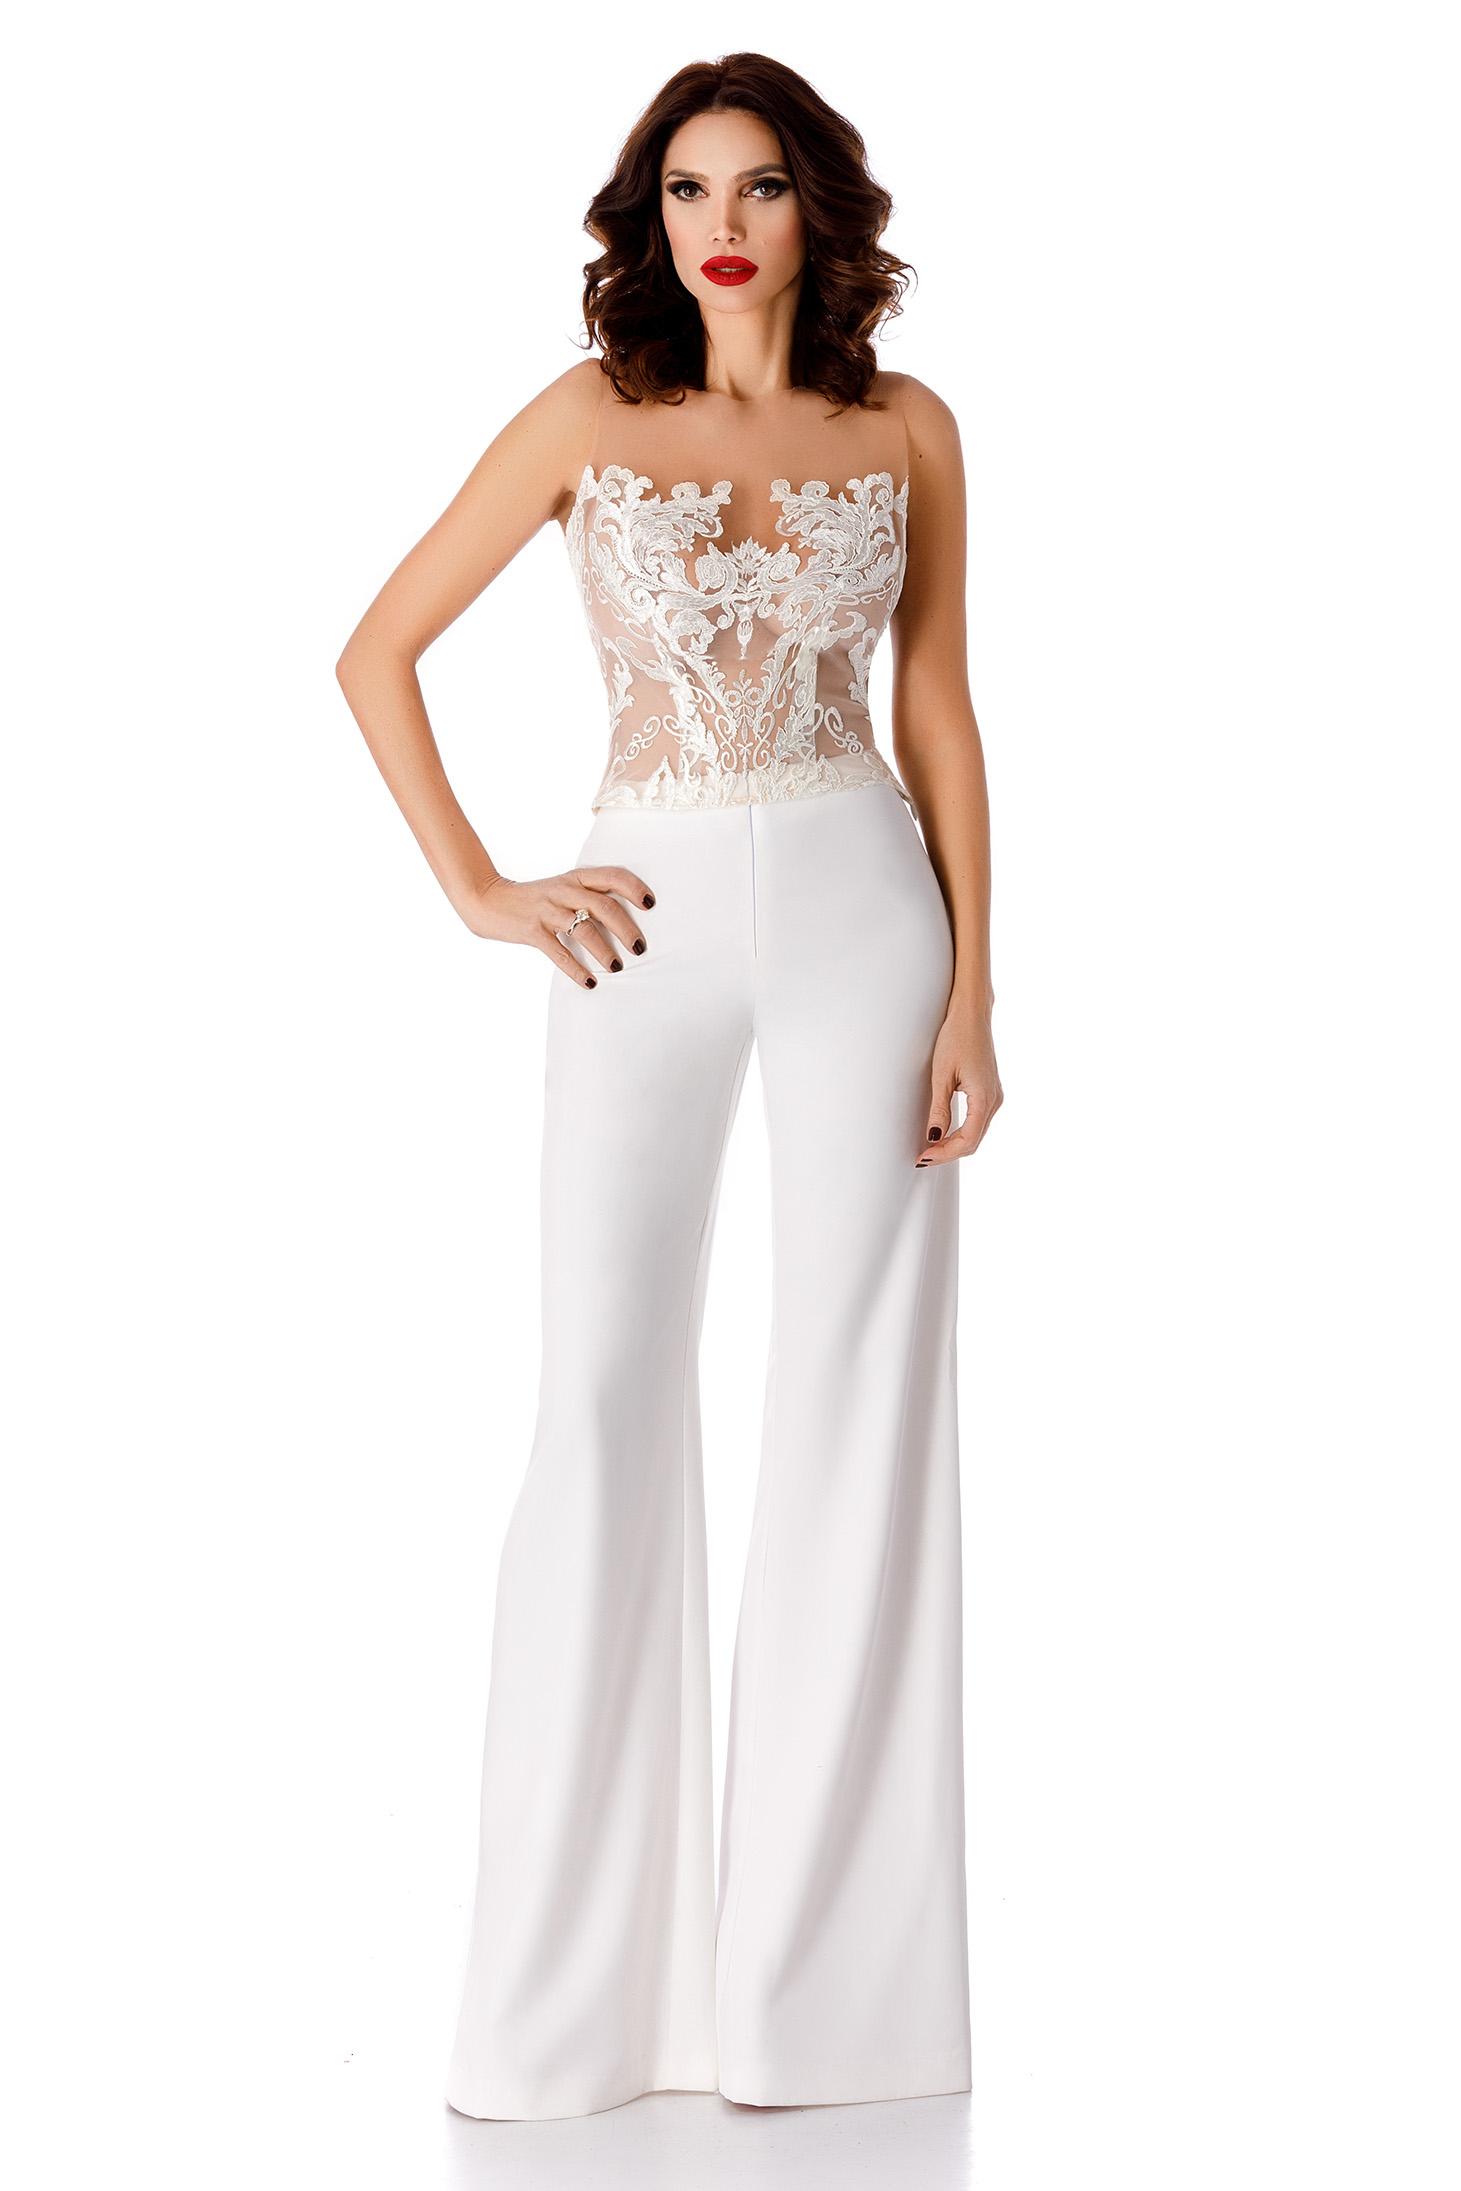 White elegant trousers high waisted flared slightly elastic fabric